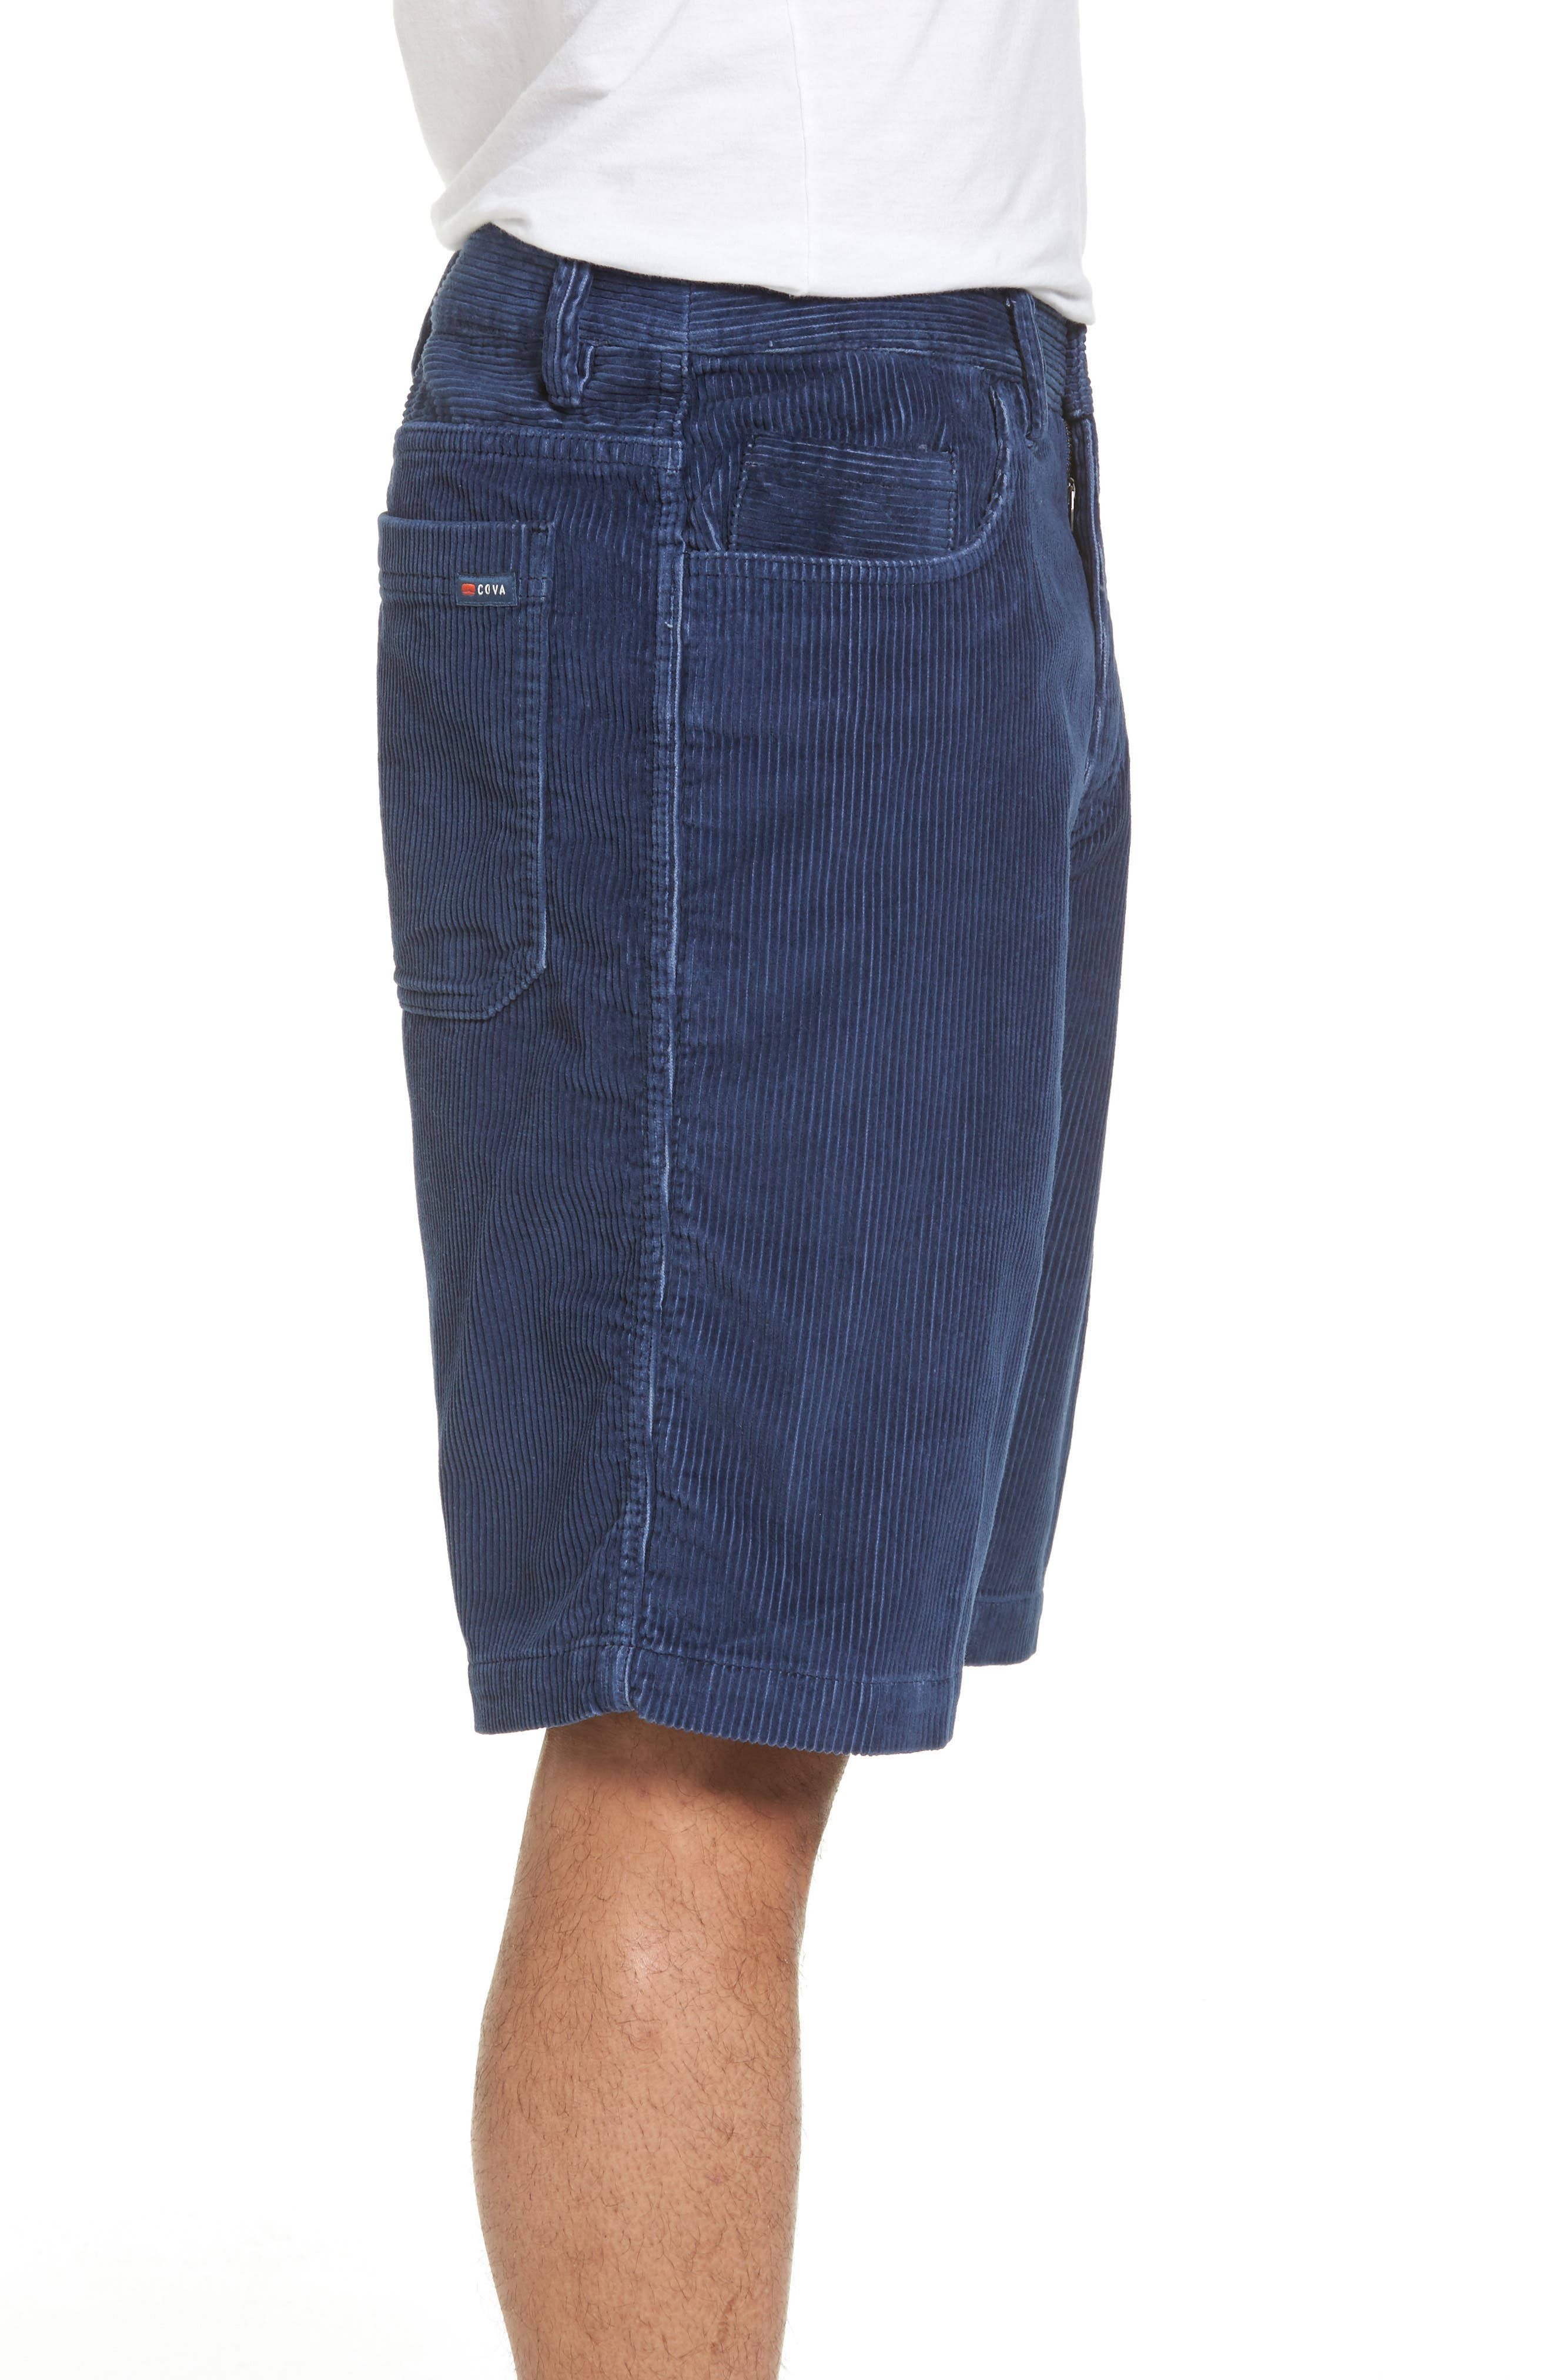 Kordo Corduroy Walking Shorts,                             Alternate thumbnail 3, color,                             410